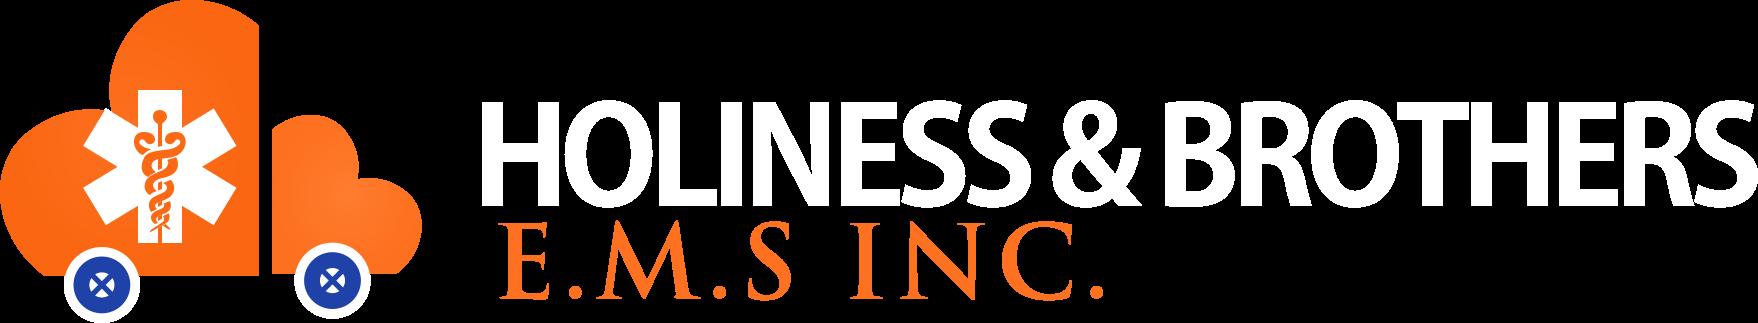 Holiness & Brothers E.M.S, Inc. - Logo